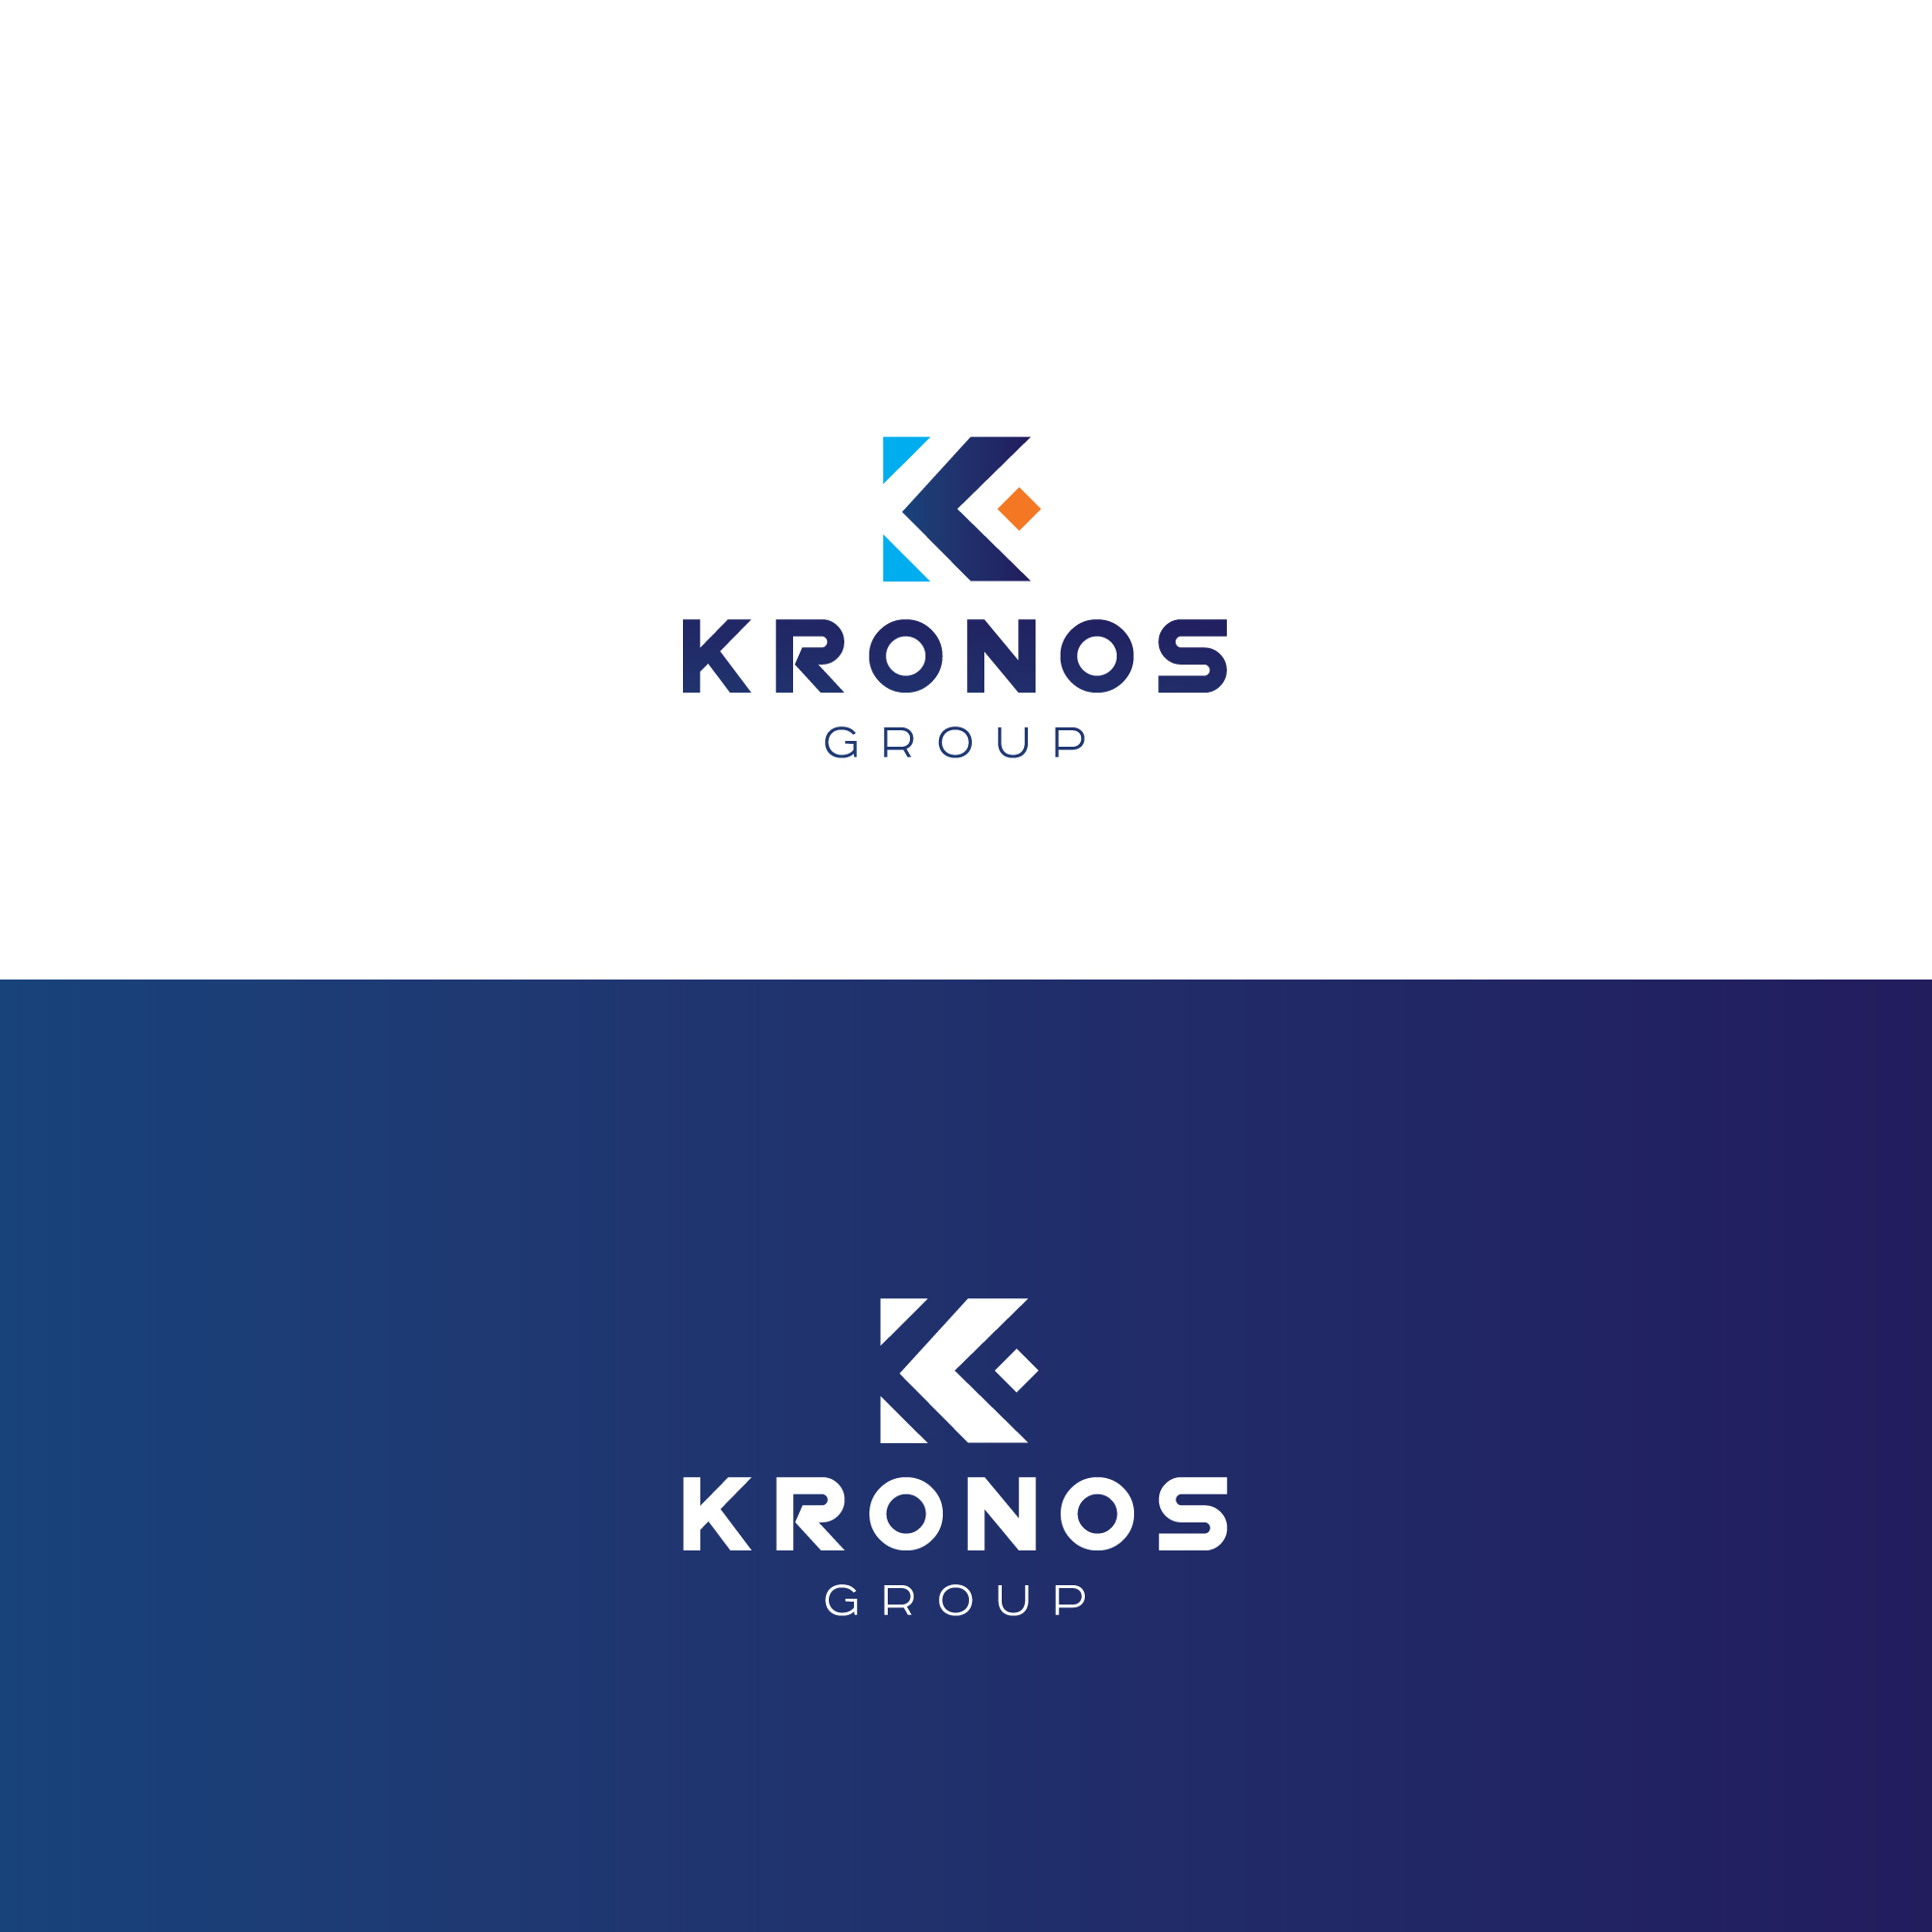 Разработать логотип KRONOS фото f_2755faf17a56a797.jpg